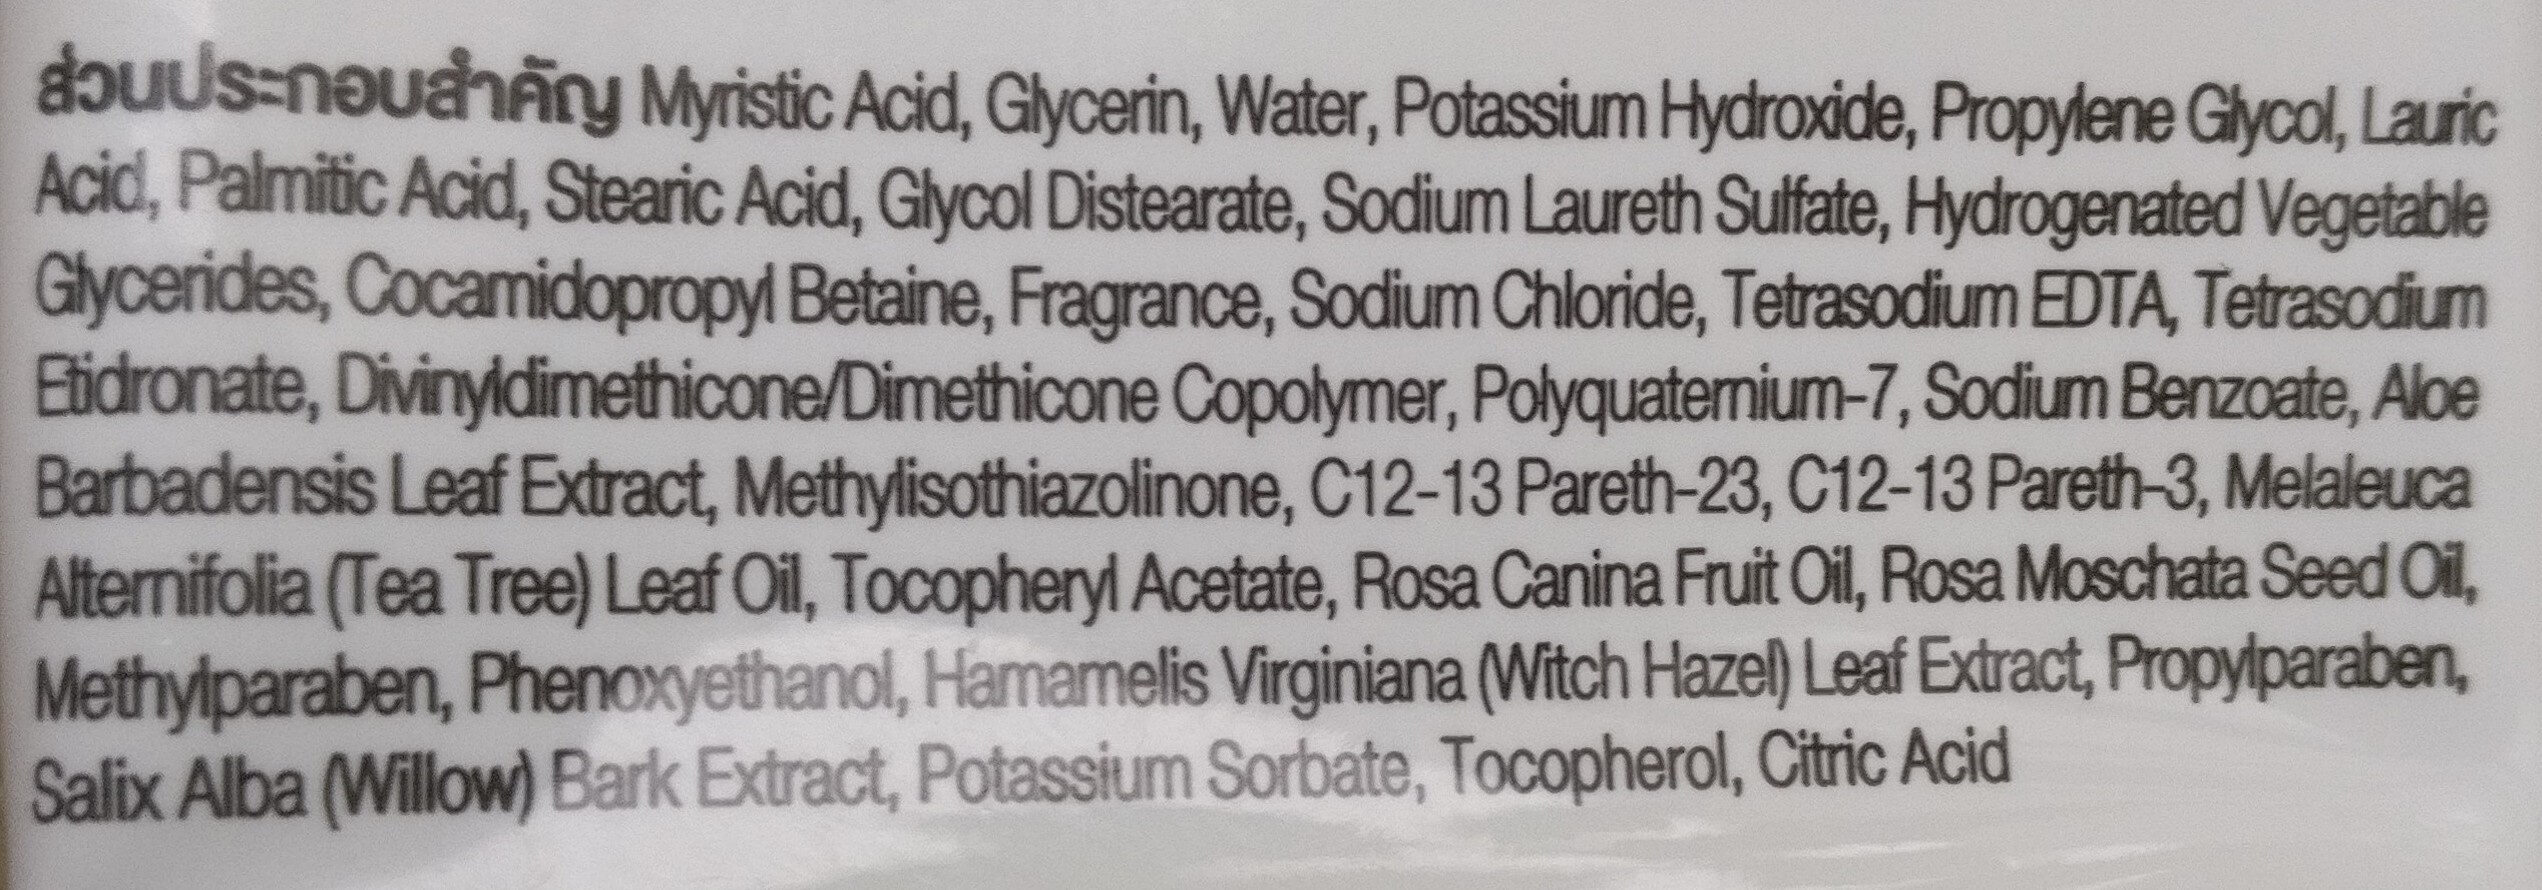 Facial Foam - Ingredients - en